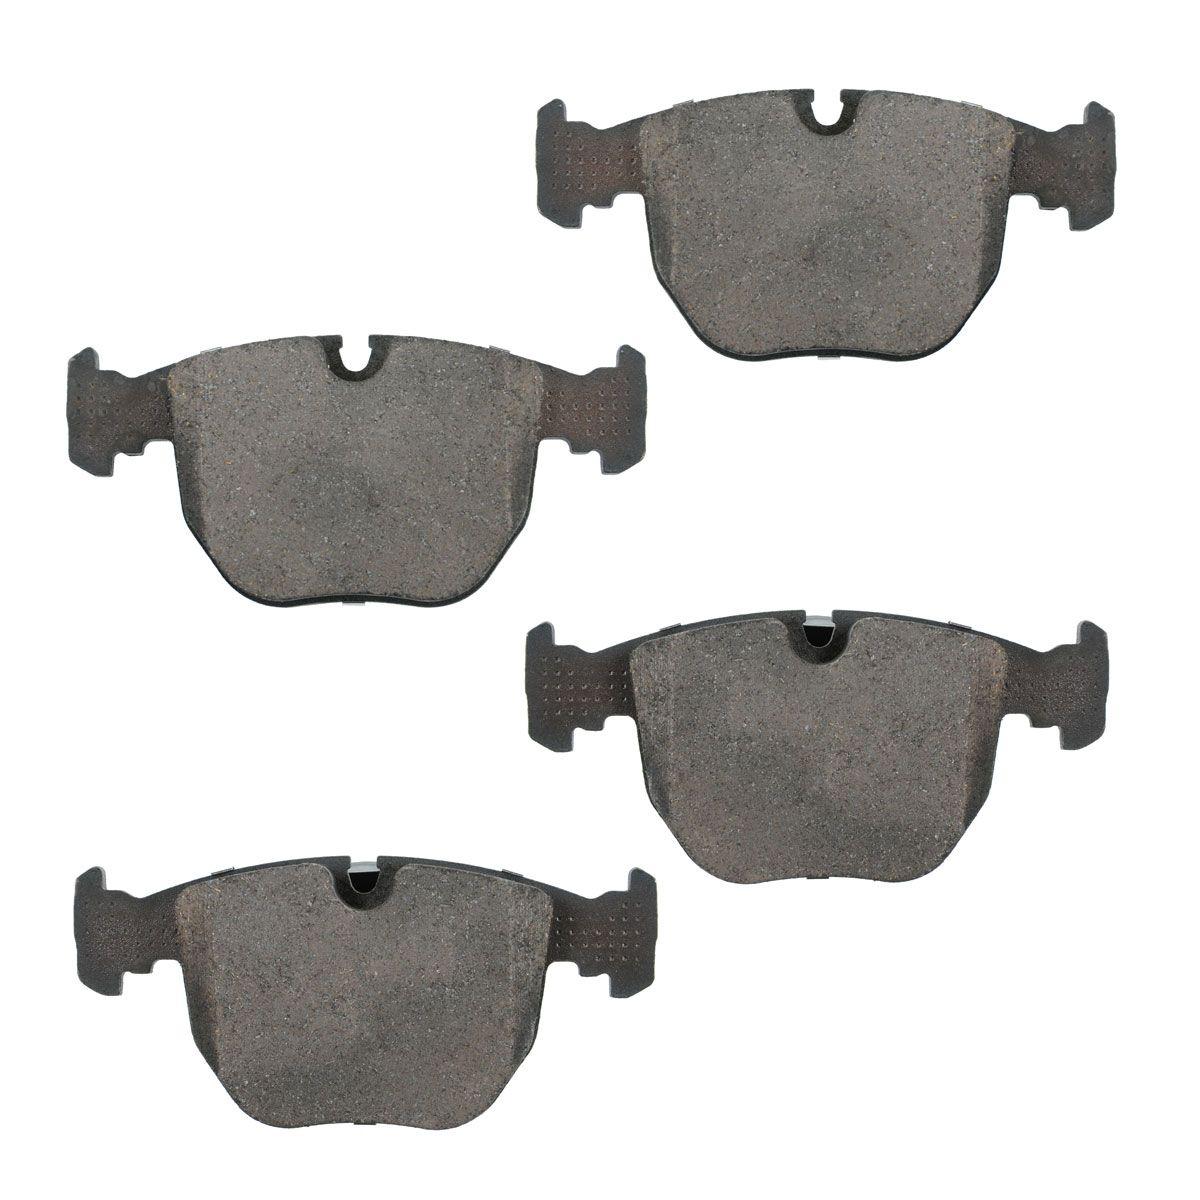 Front Ceramic Disc Brake Pad Rotor /& Sensor Kit LH /& RH Sides for 00-06 BMW X5